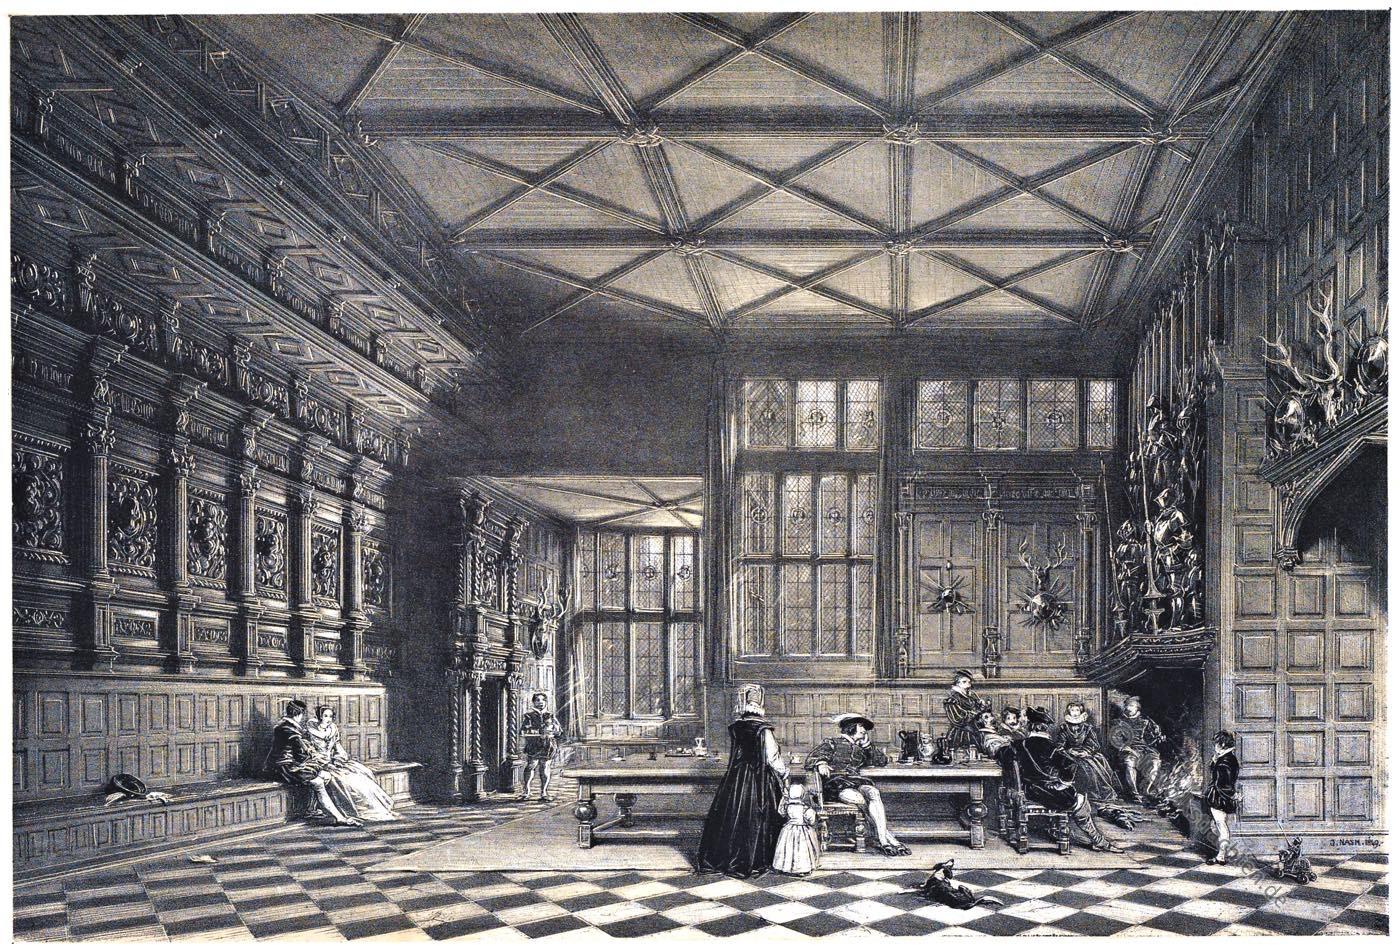 Halle, Saal, Speke, Hall, Manson, Lancashire, Tudor, Architektur, Elisabethanisch, Renaissance, Joseph Nash, Tudorstil